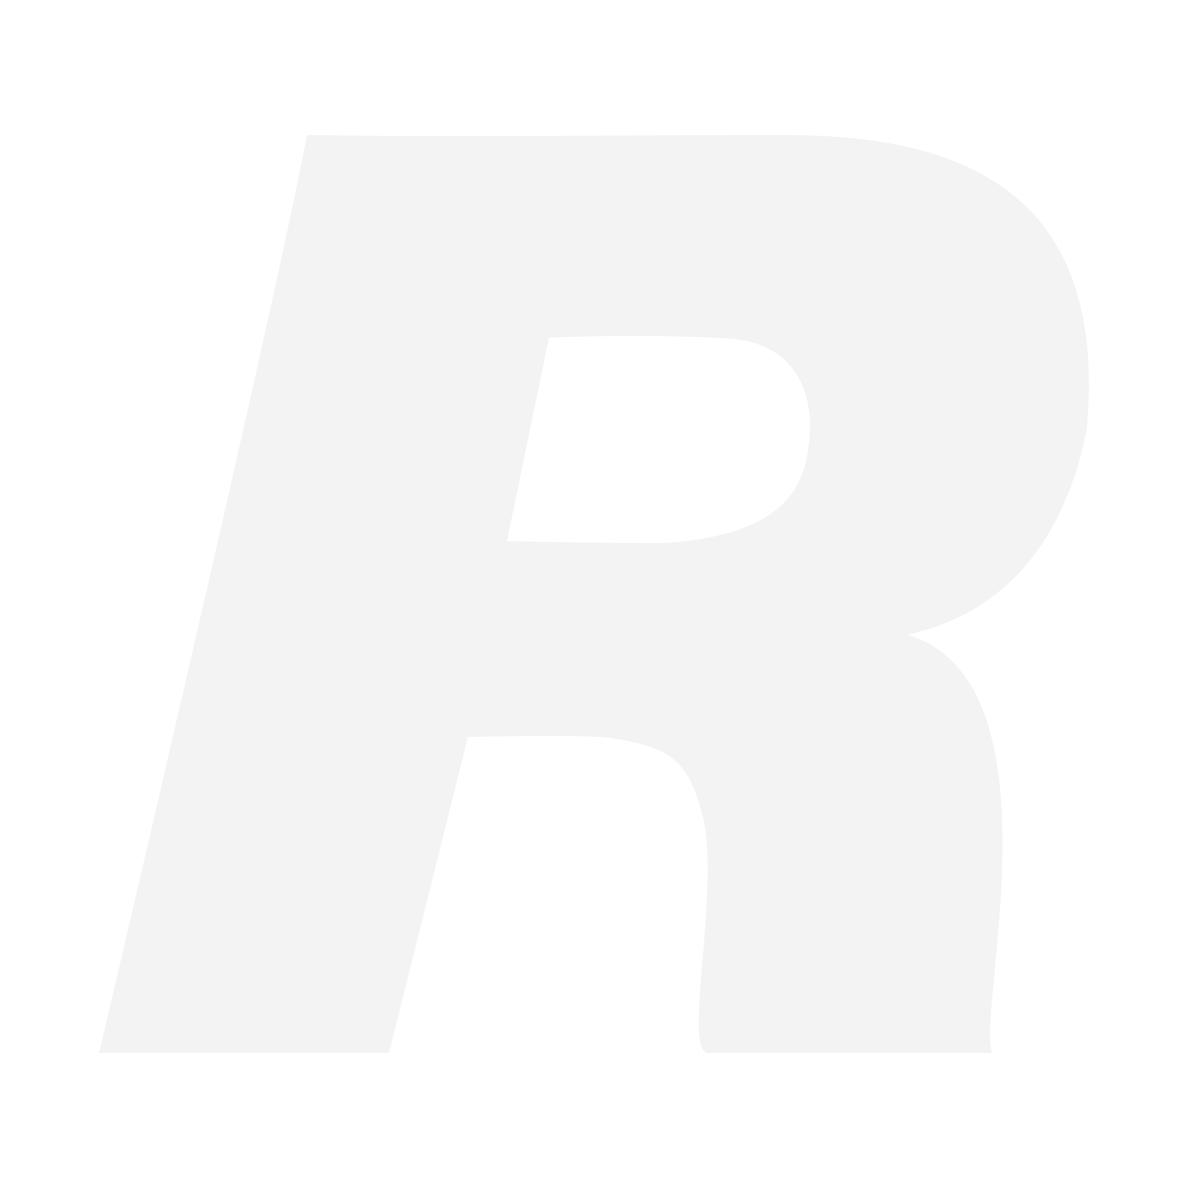 Sony AG-R2 Grip -kuvauskahva (RX100/M2/M3)